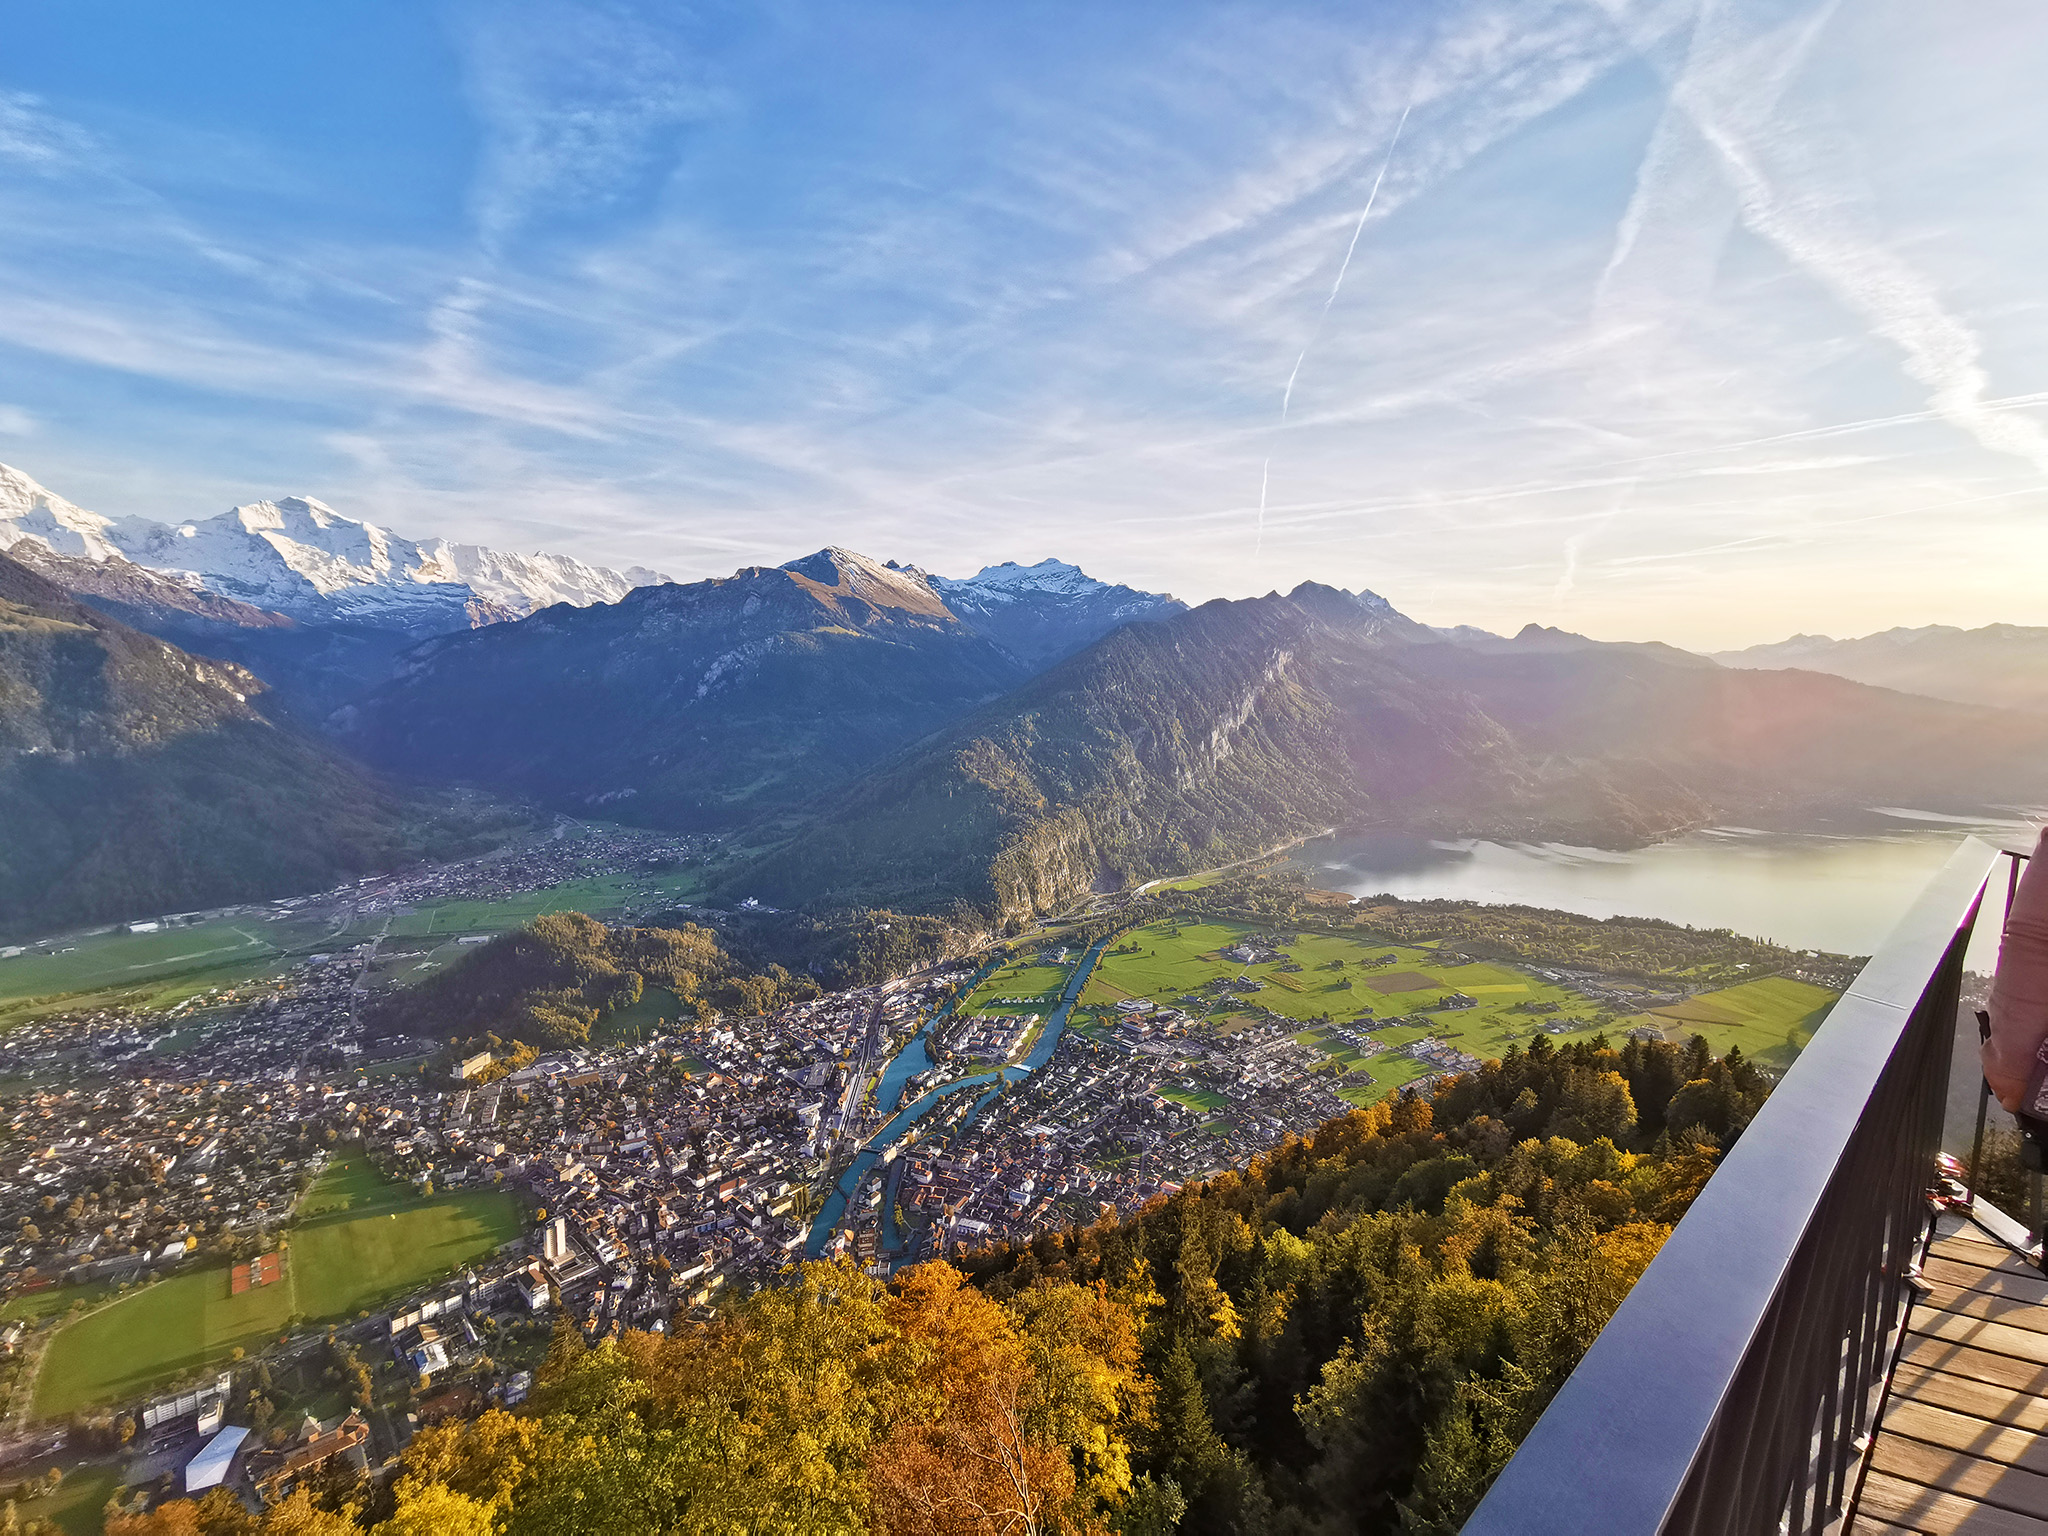 kt_2020_360_Keytours_excursions_Swisstours_interlaken_village9_2048_10